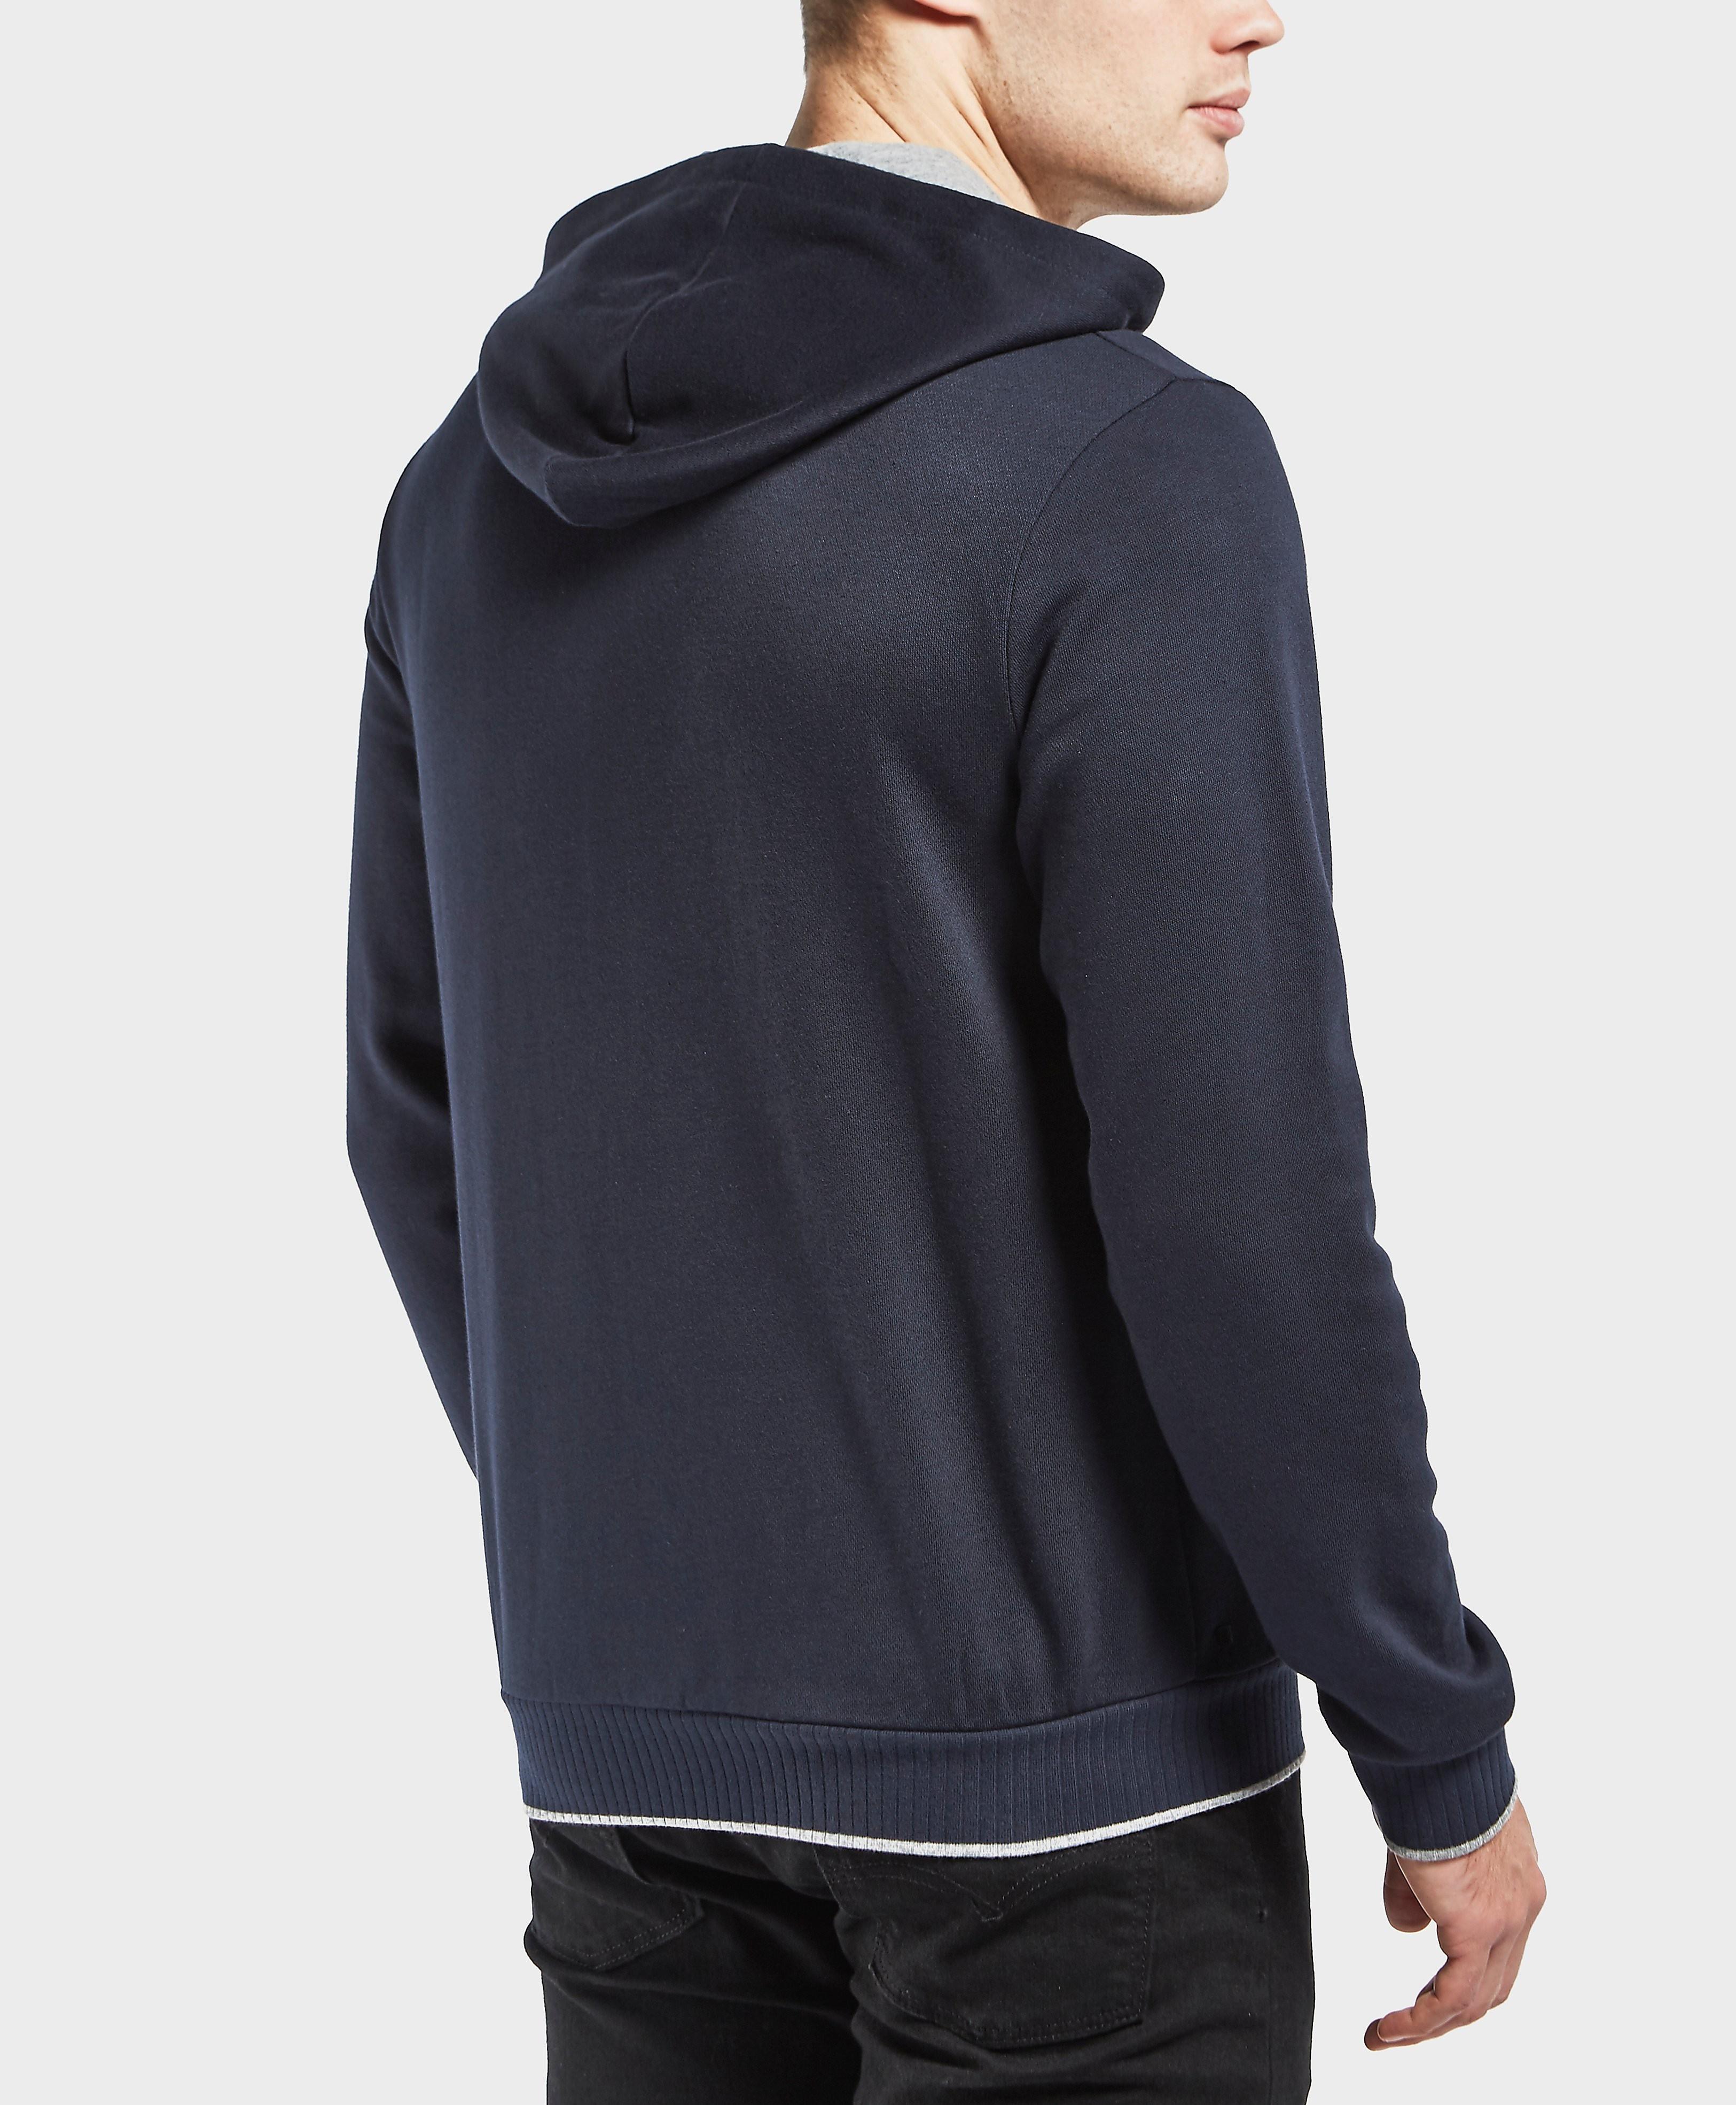 BOSS Authentic Full Zip Hoody